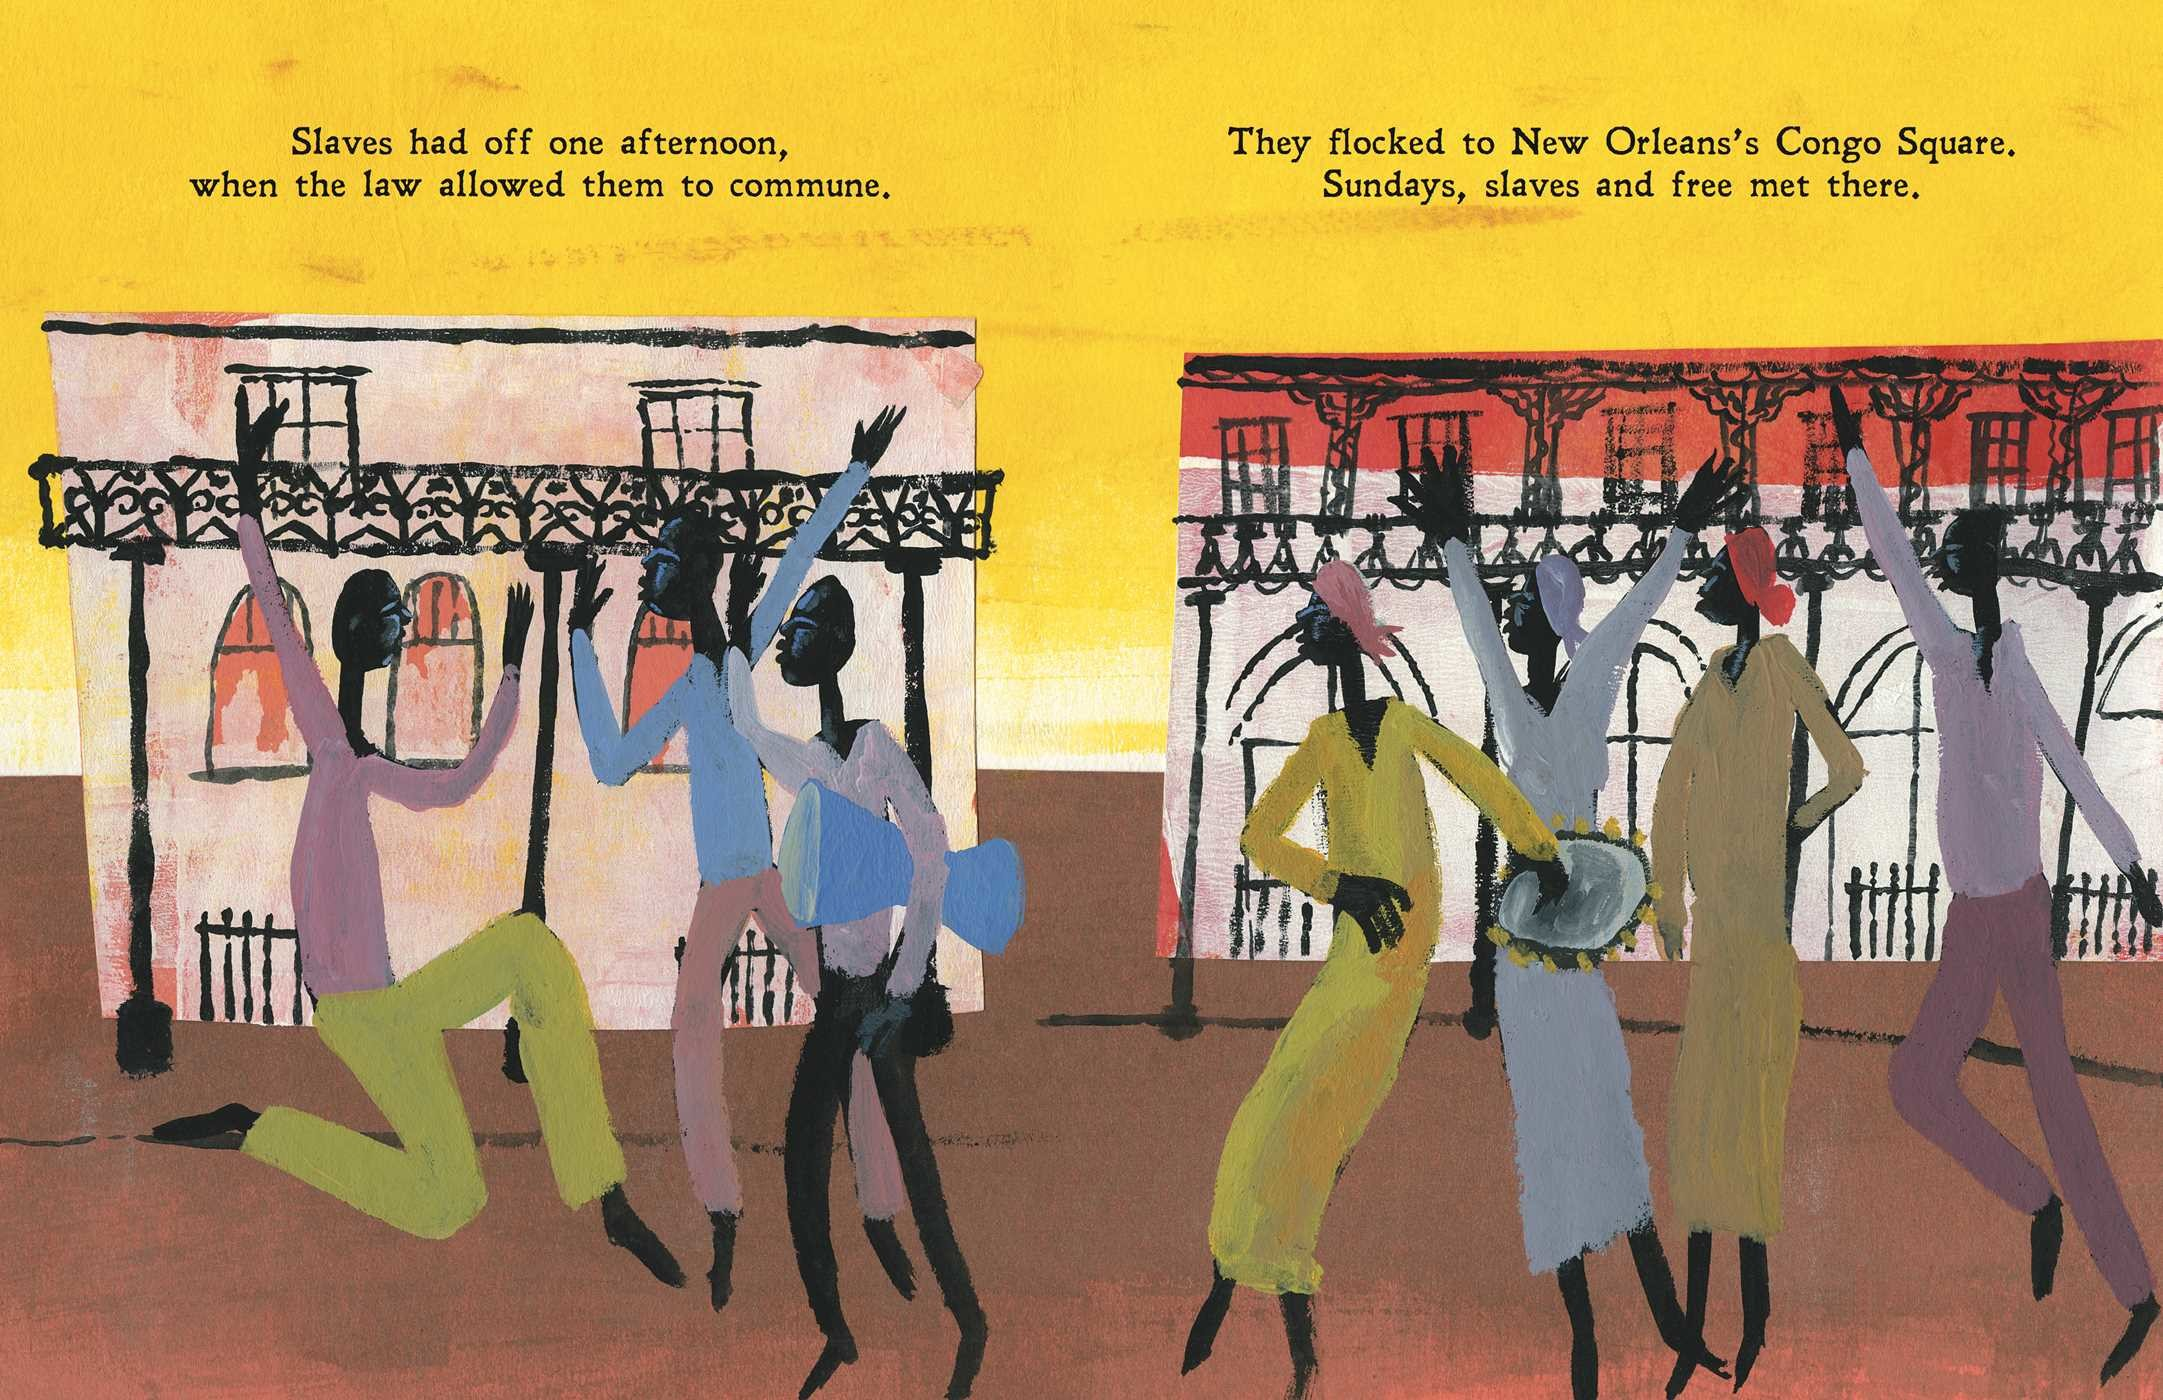 celebrate-picture-books-picture-book-review-freedom-in-congo-square-sunday